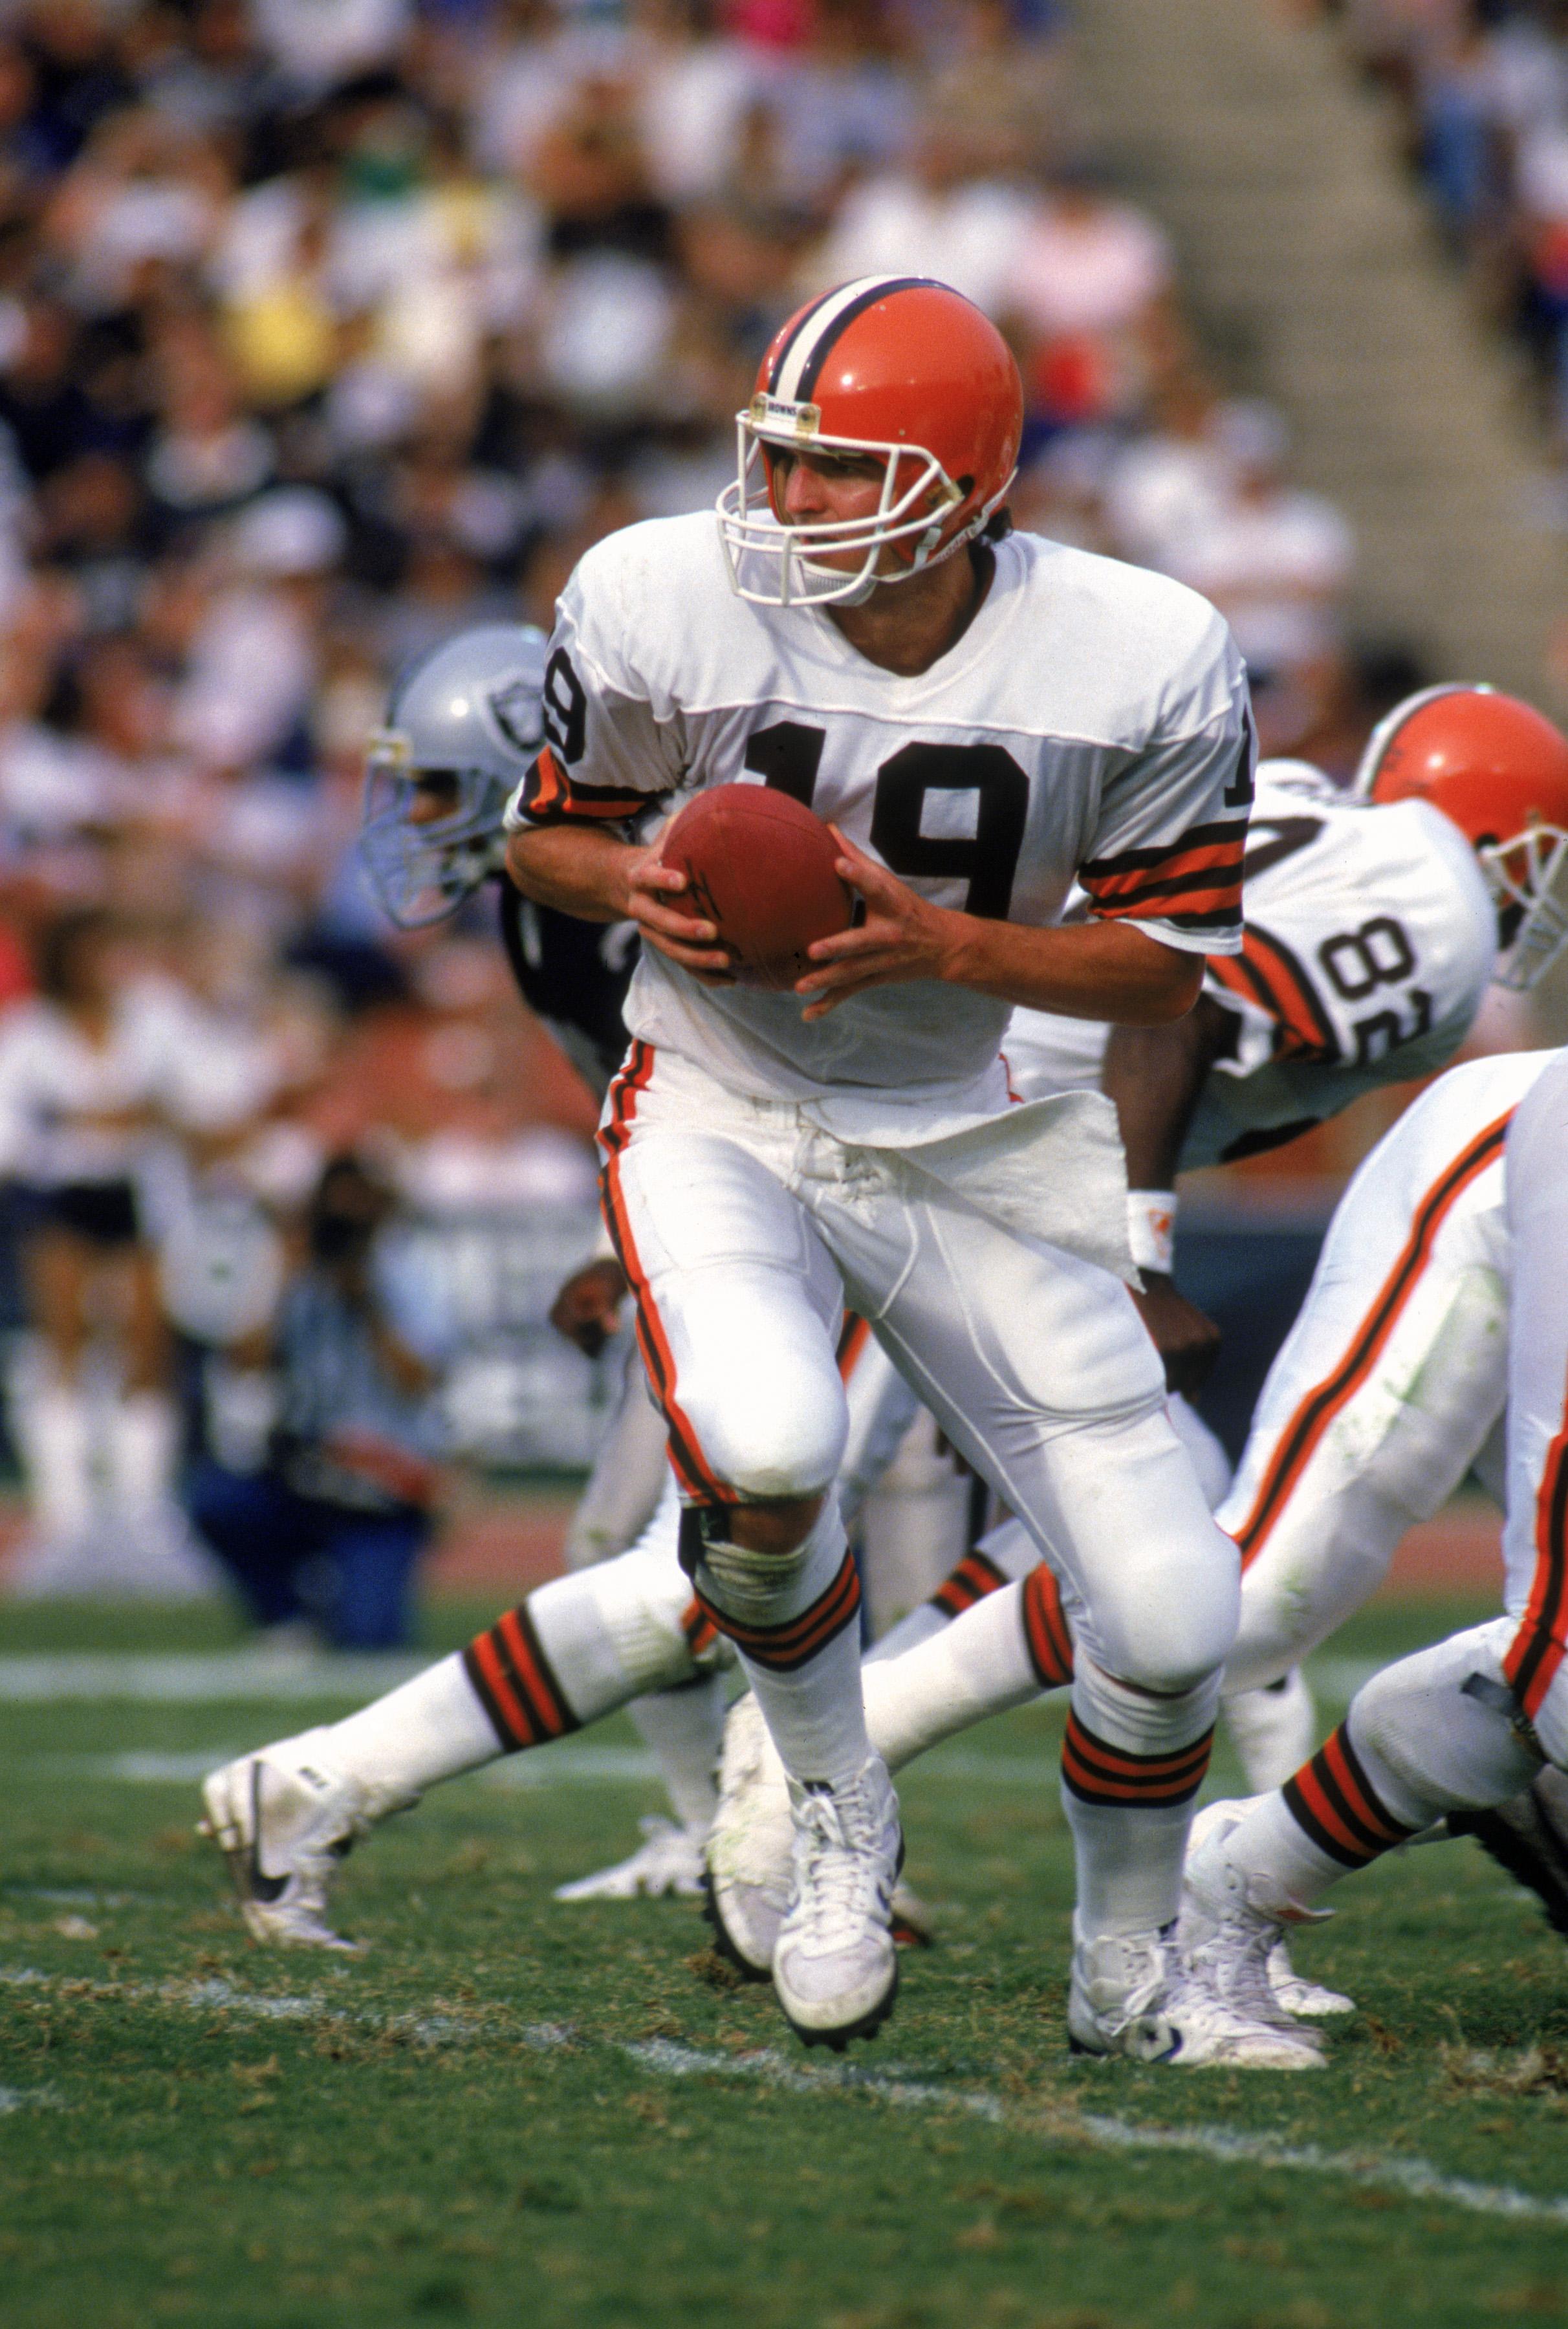 LOS ANGELES - NOVEMBER 16:  Quarterback Bernie Kosar #19 of the Cleveland Browns runs a play during a game against the Los Angeles Raiders at the Los Angeles Memorial Coliseum on November 16, 1986 in Los Angeles, California.  The Raiders won 27-14.  (Phot